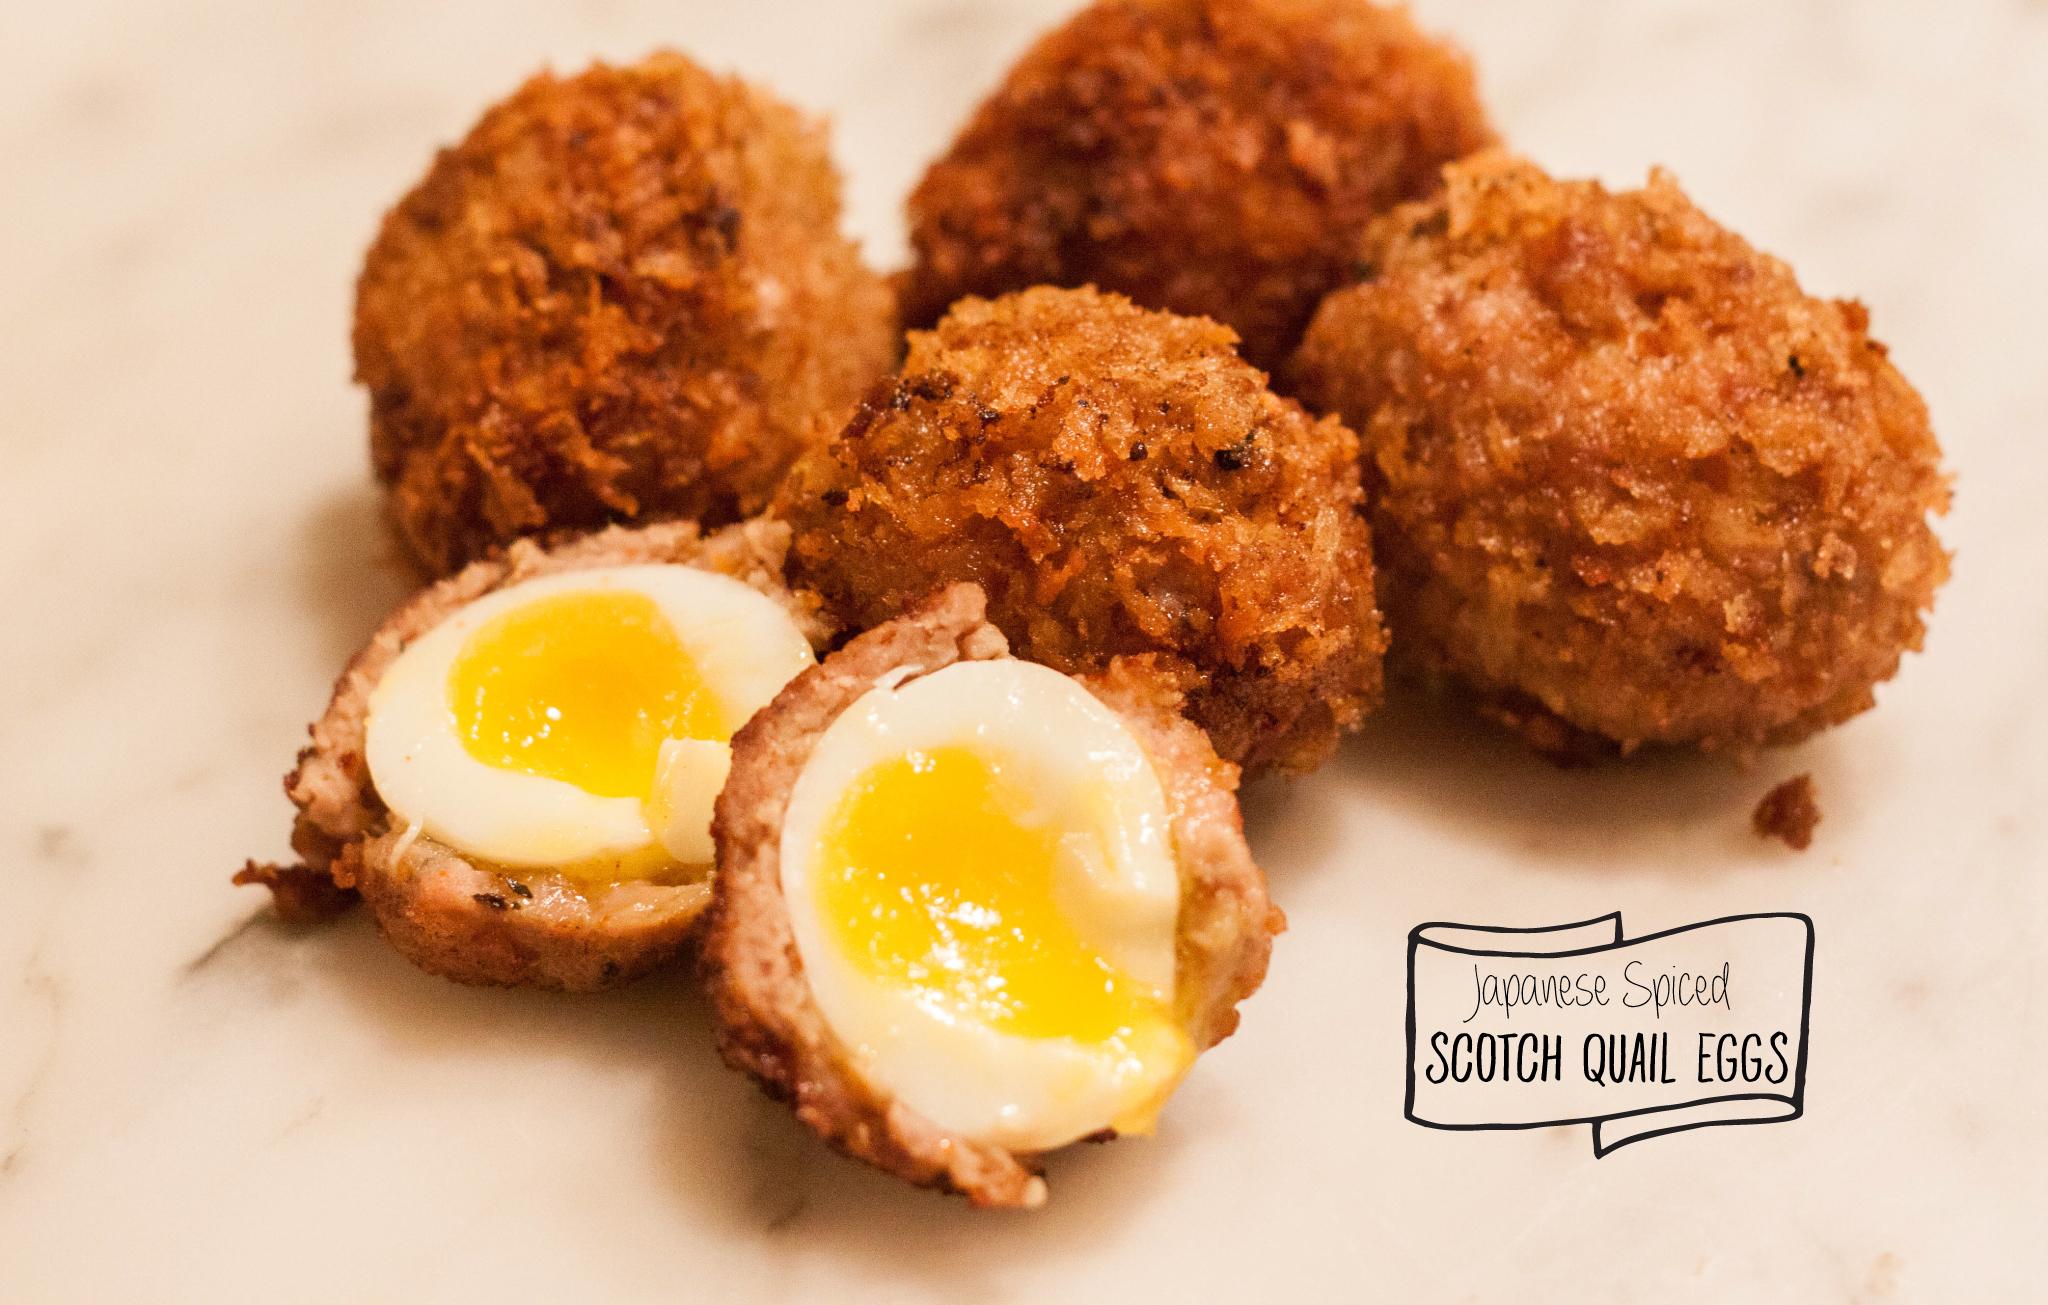 Japanese Spiced Scotch Quail Eggs • The Savoury CellarThe Savoury Cellar